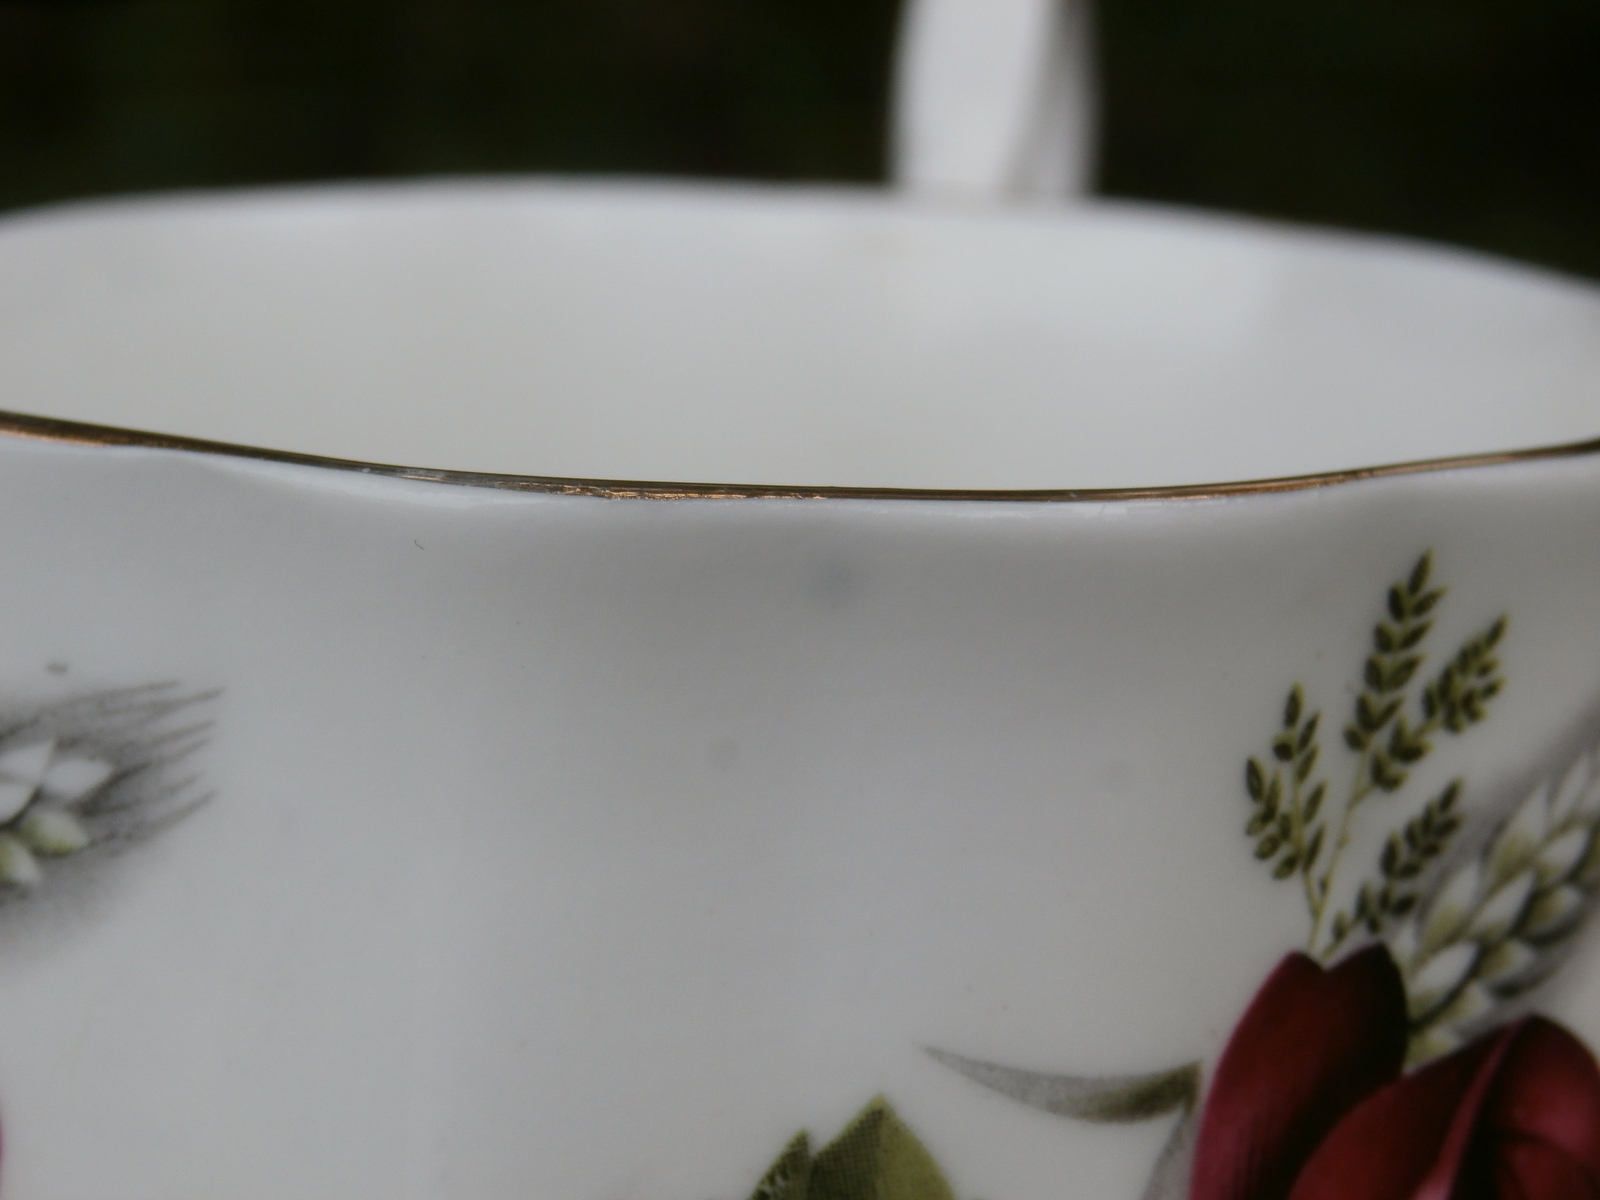 Elizabethan Rose Cup - Ornate Vintage Bone China, Made in England